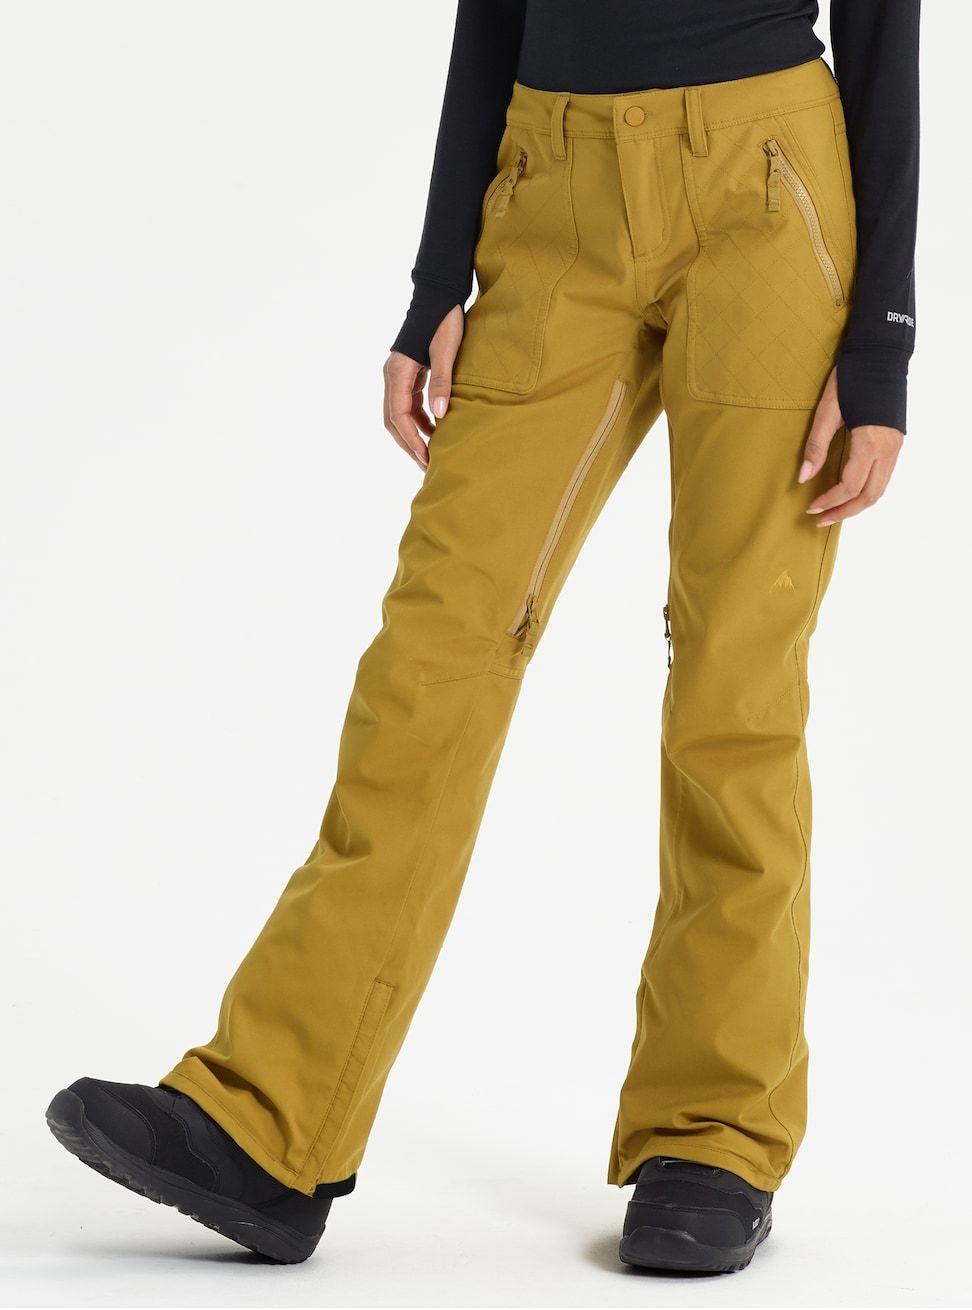 Women's Burton Vida Pant in 2020   Pants, Women, Rider jeans